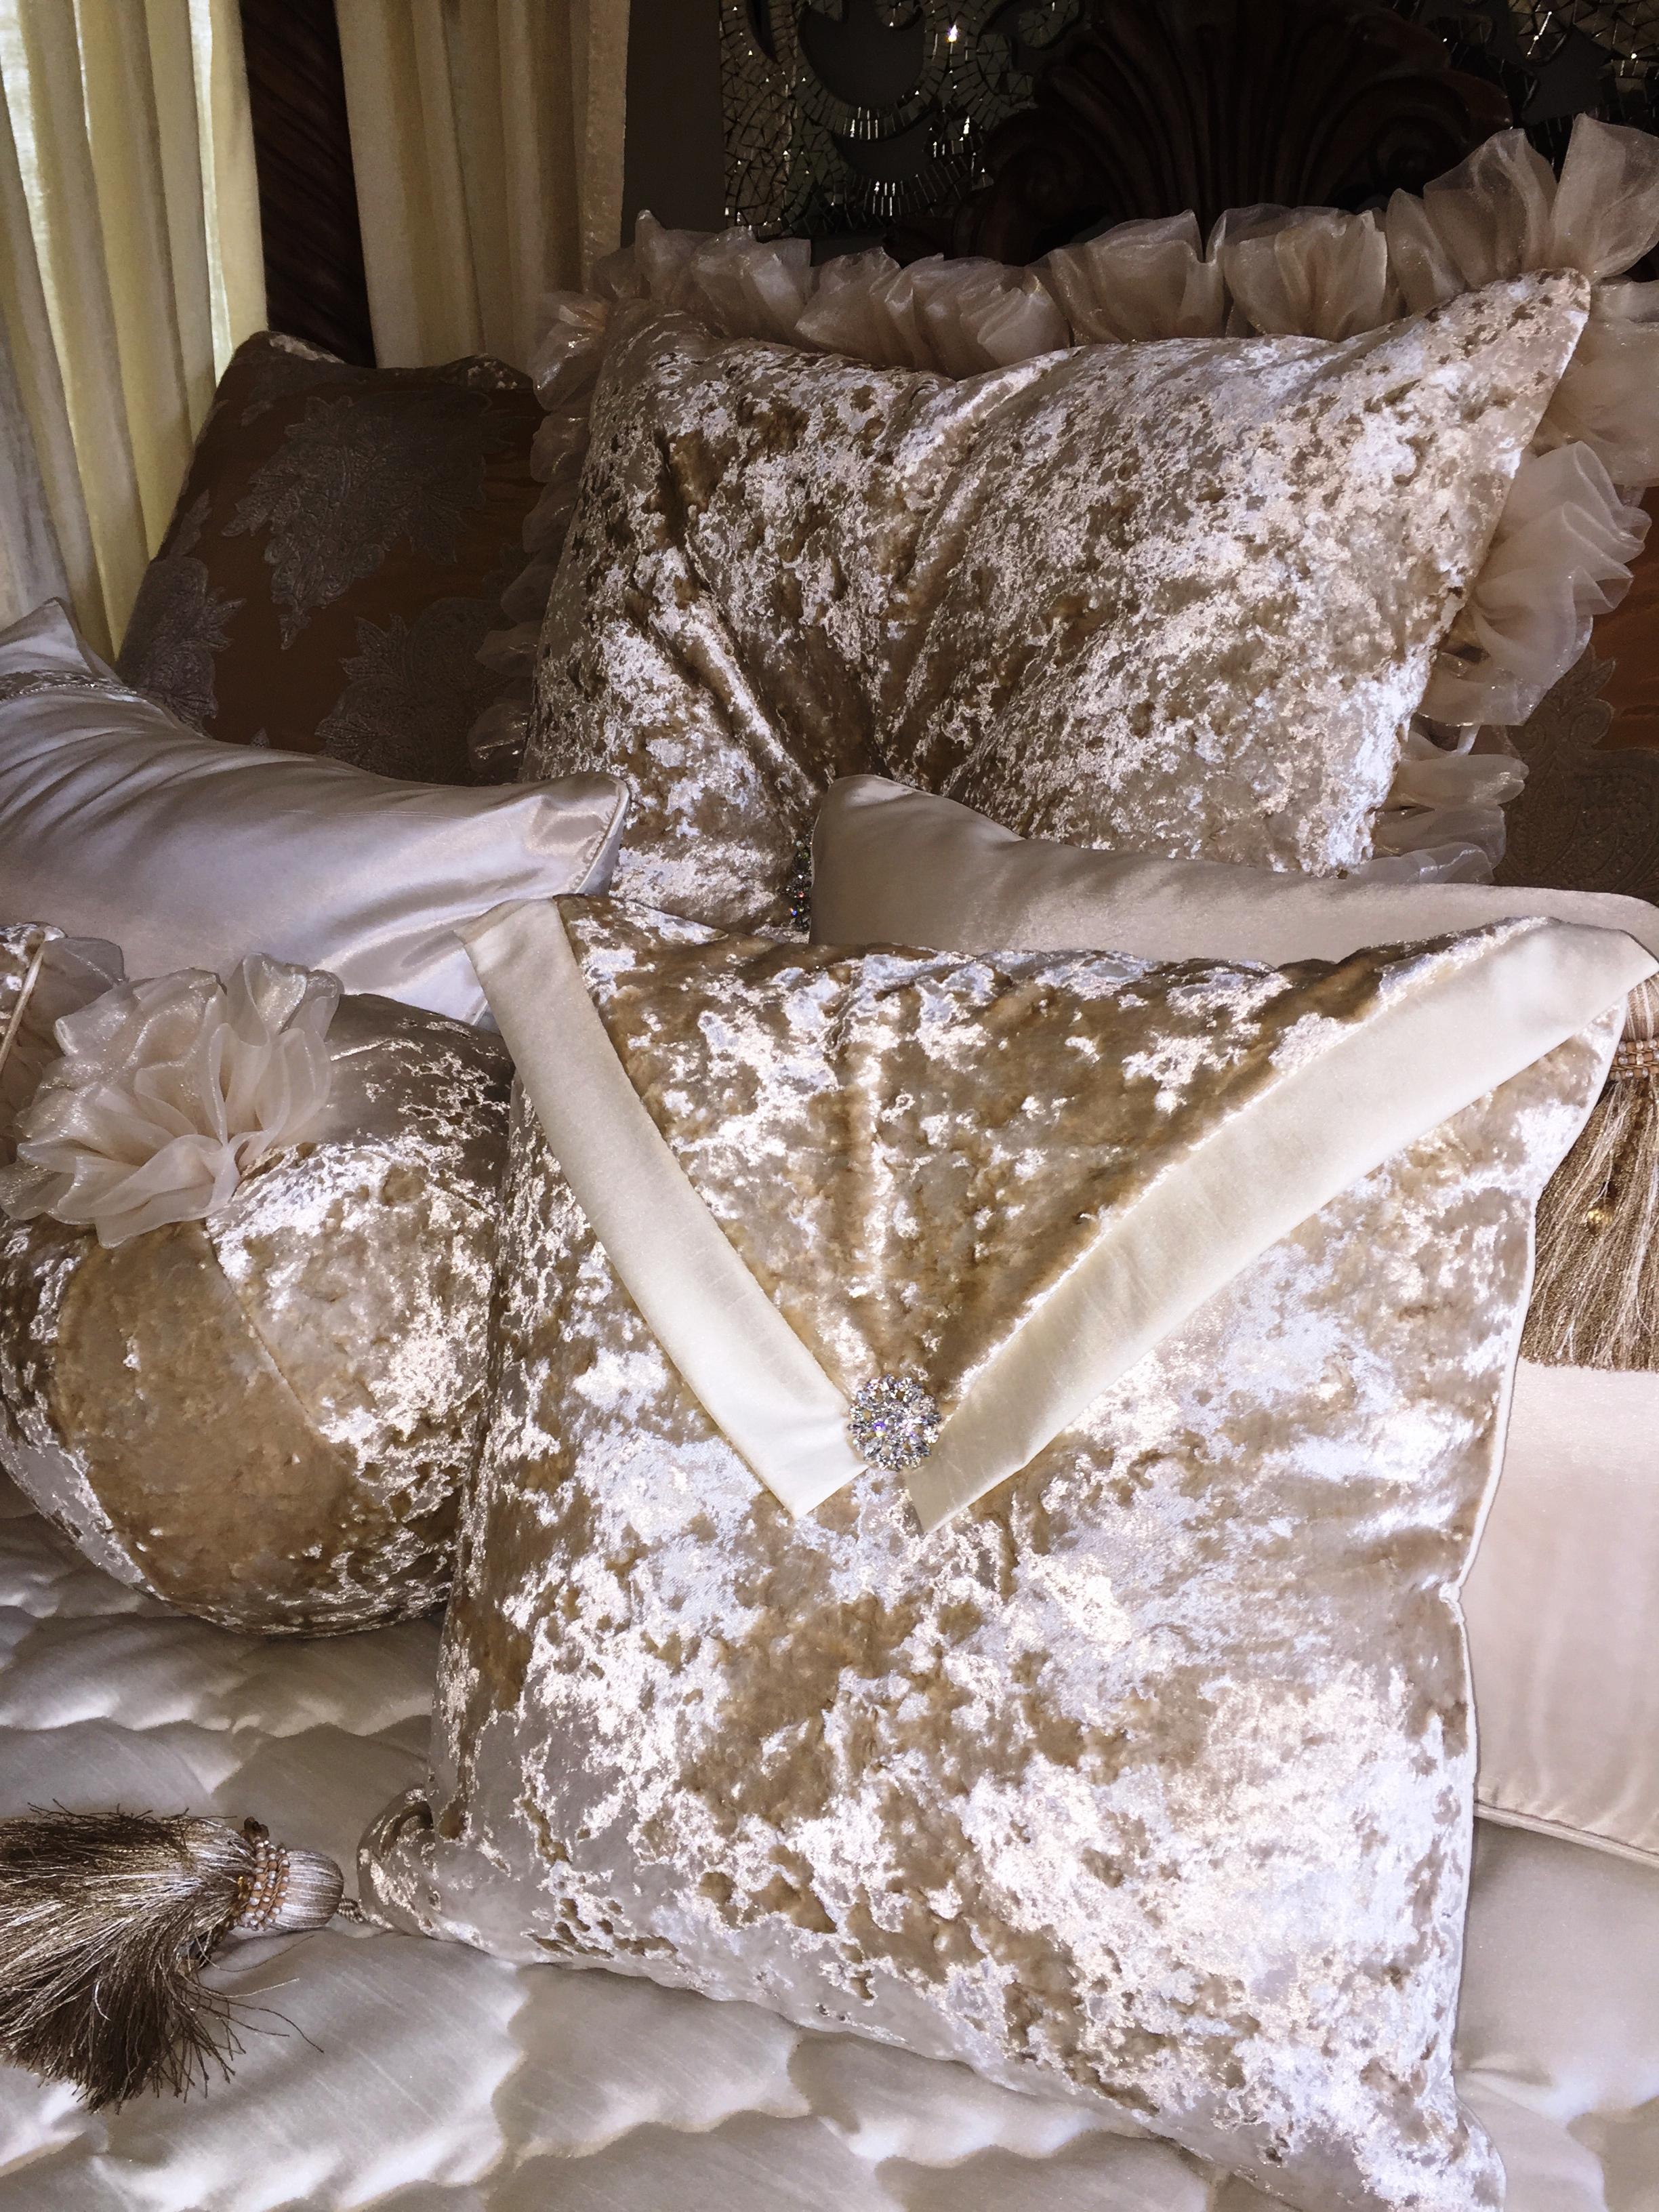 Canali Drapery Studio Custom Design Luxury Bedding and Pillows (69).JPG